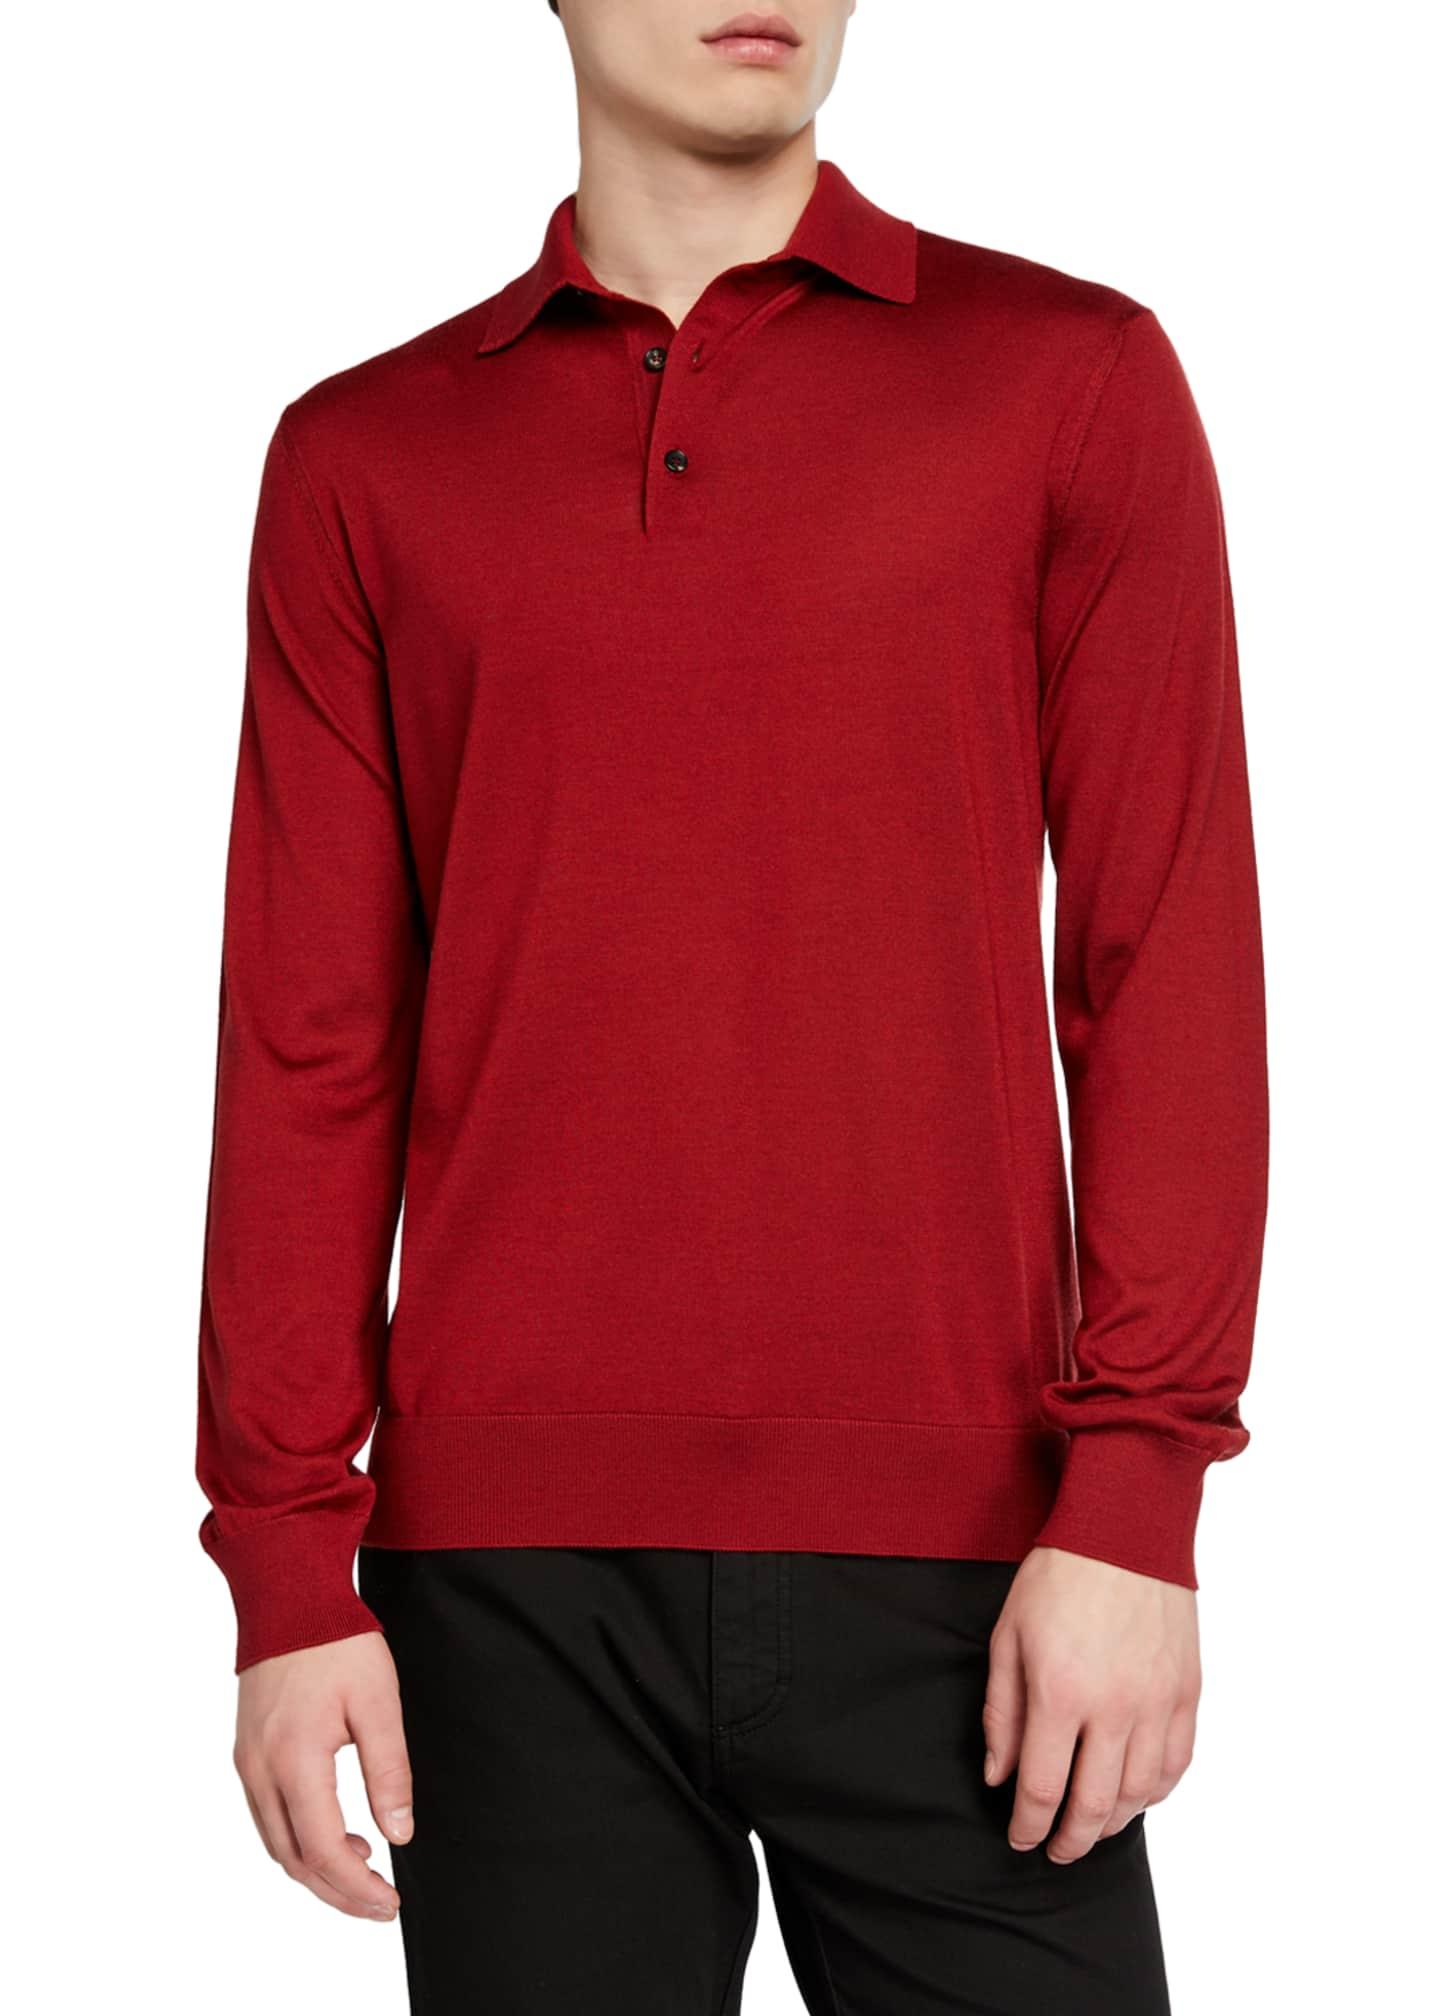 Ermenegildo Zegna Men's Cashmere-Blend Long-Sleeve Polo Shirt